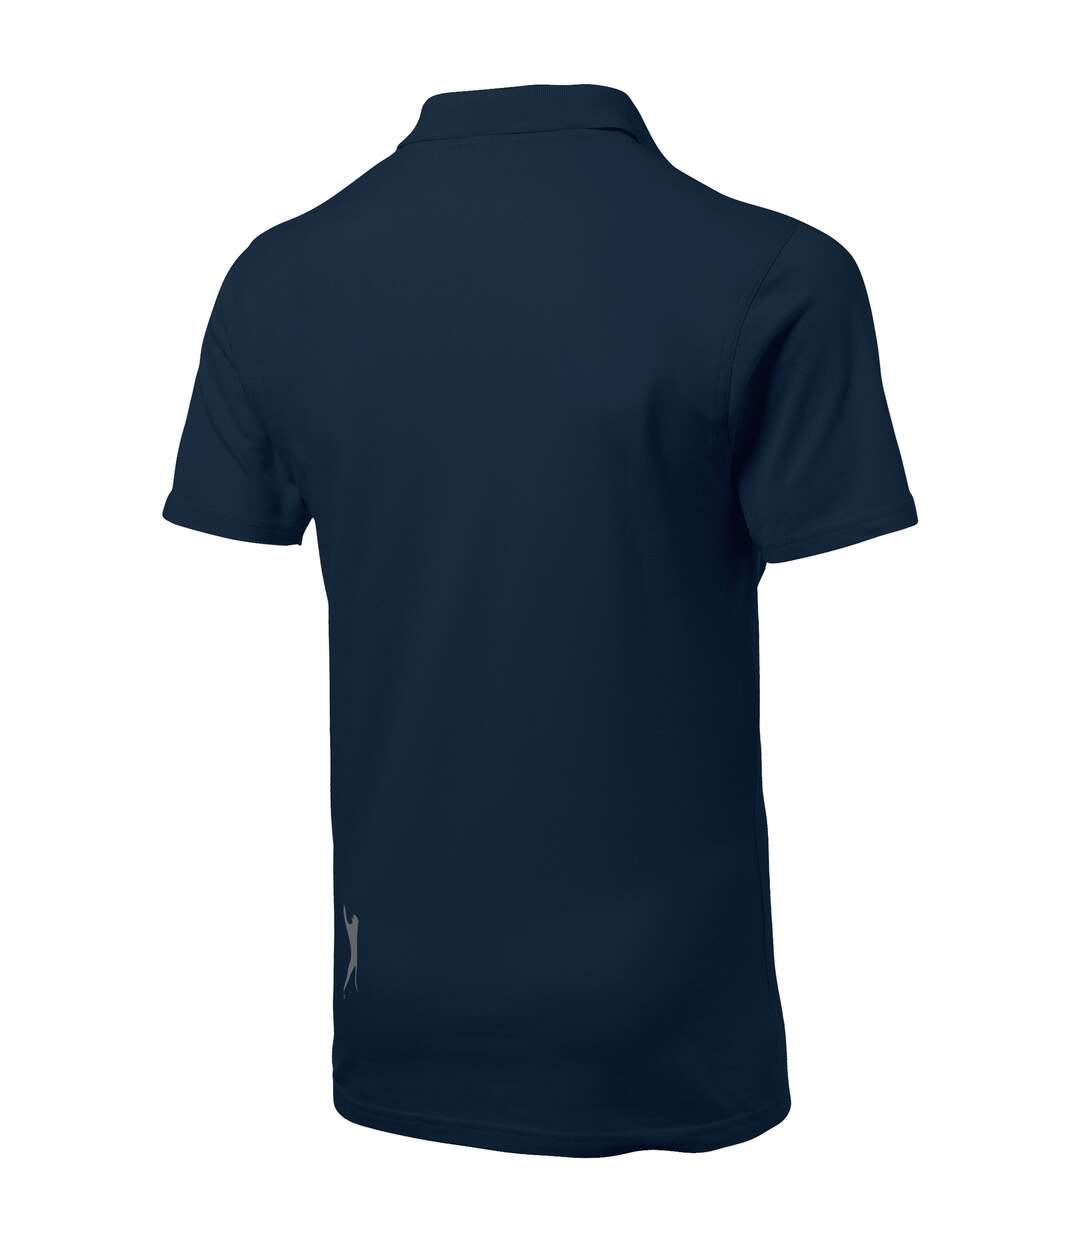 Slazenger Mens Advantage Short Sleeve Polo (Navy) - UTPF1738